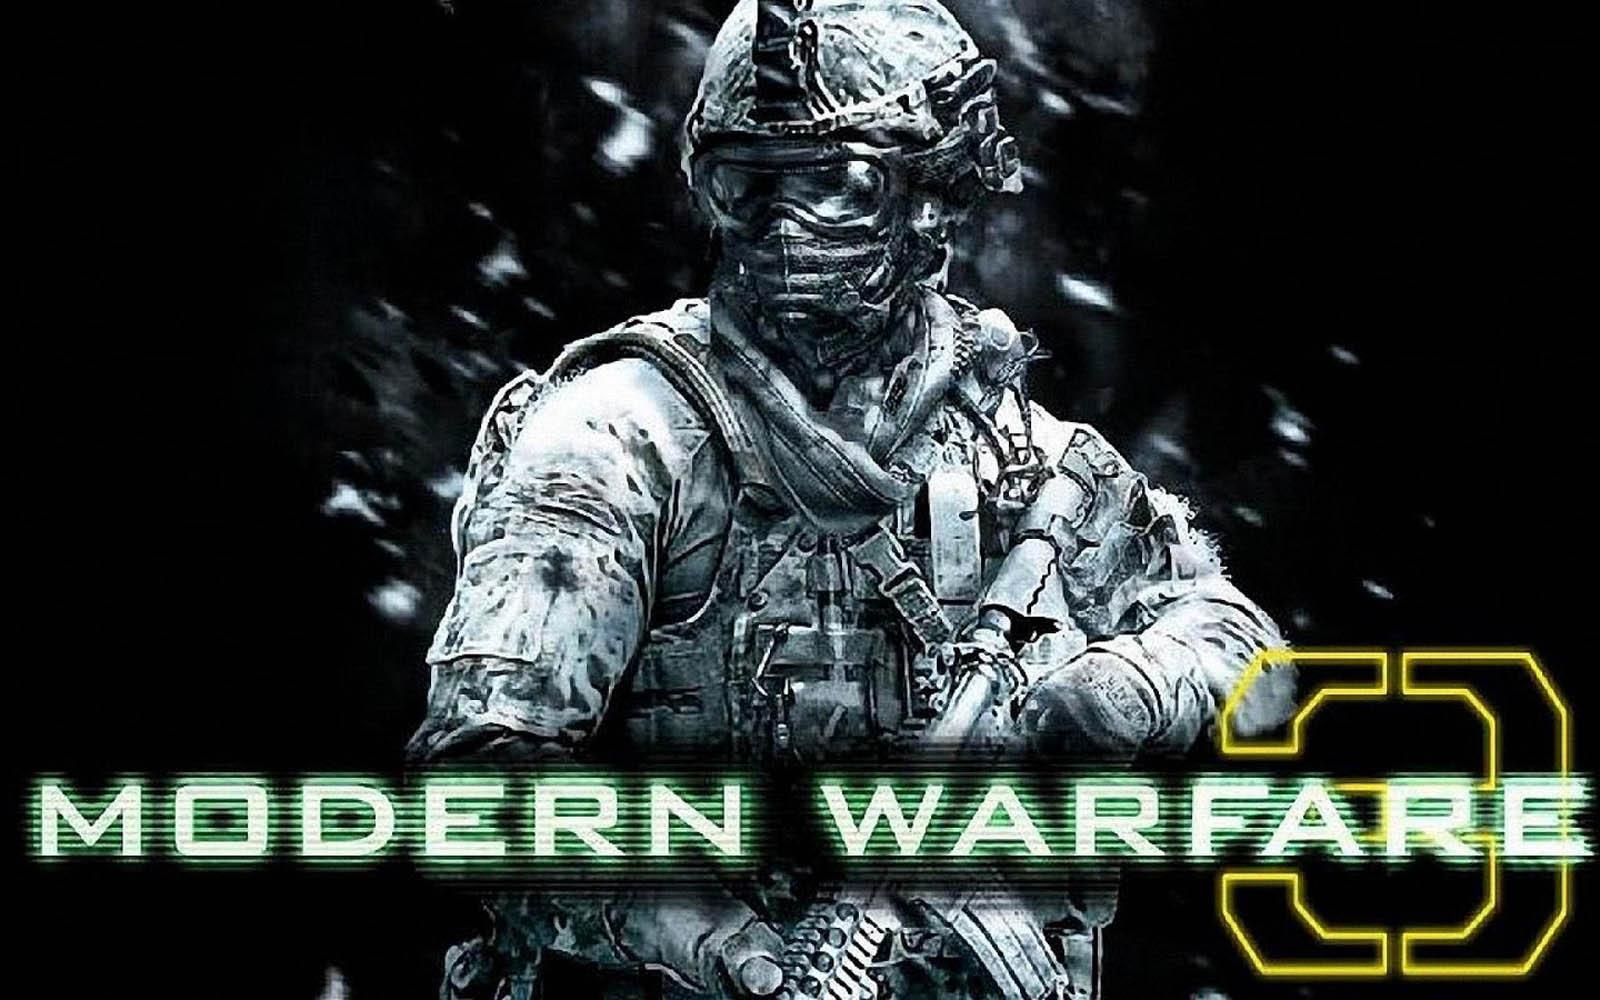 Call Of Duty Modern Warfare 3 Wallpapers